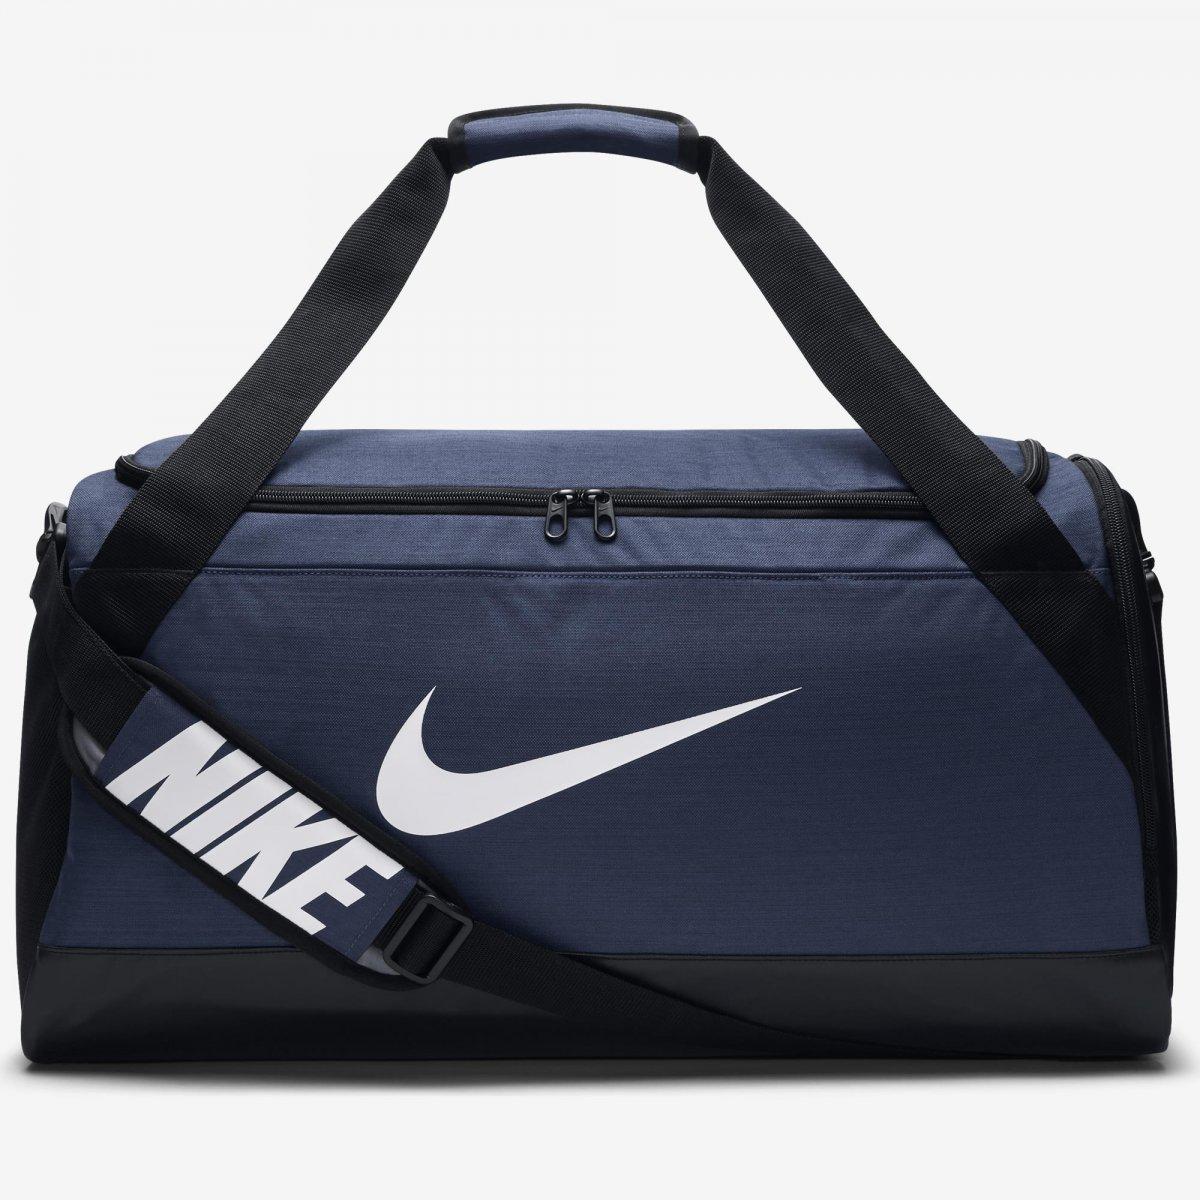 3761cfb39 Bolsa Esportiva Nike Brasilia Duffel Médium BA5334-410 - Marinho ...